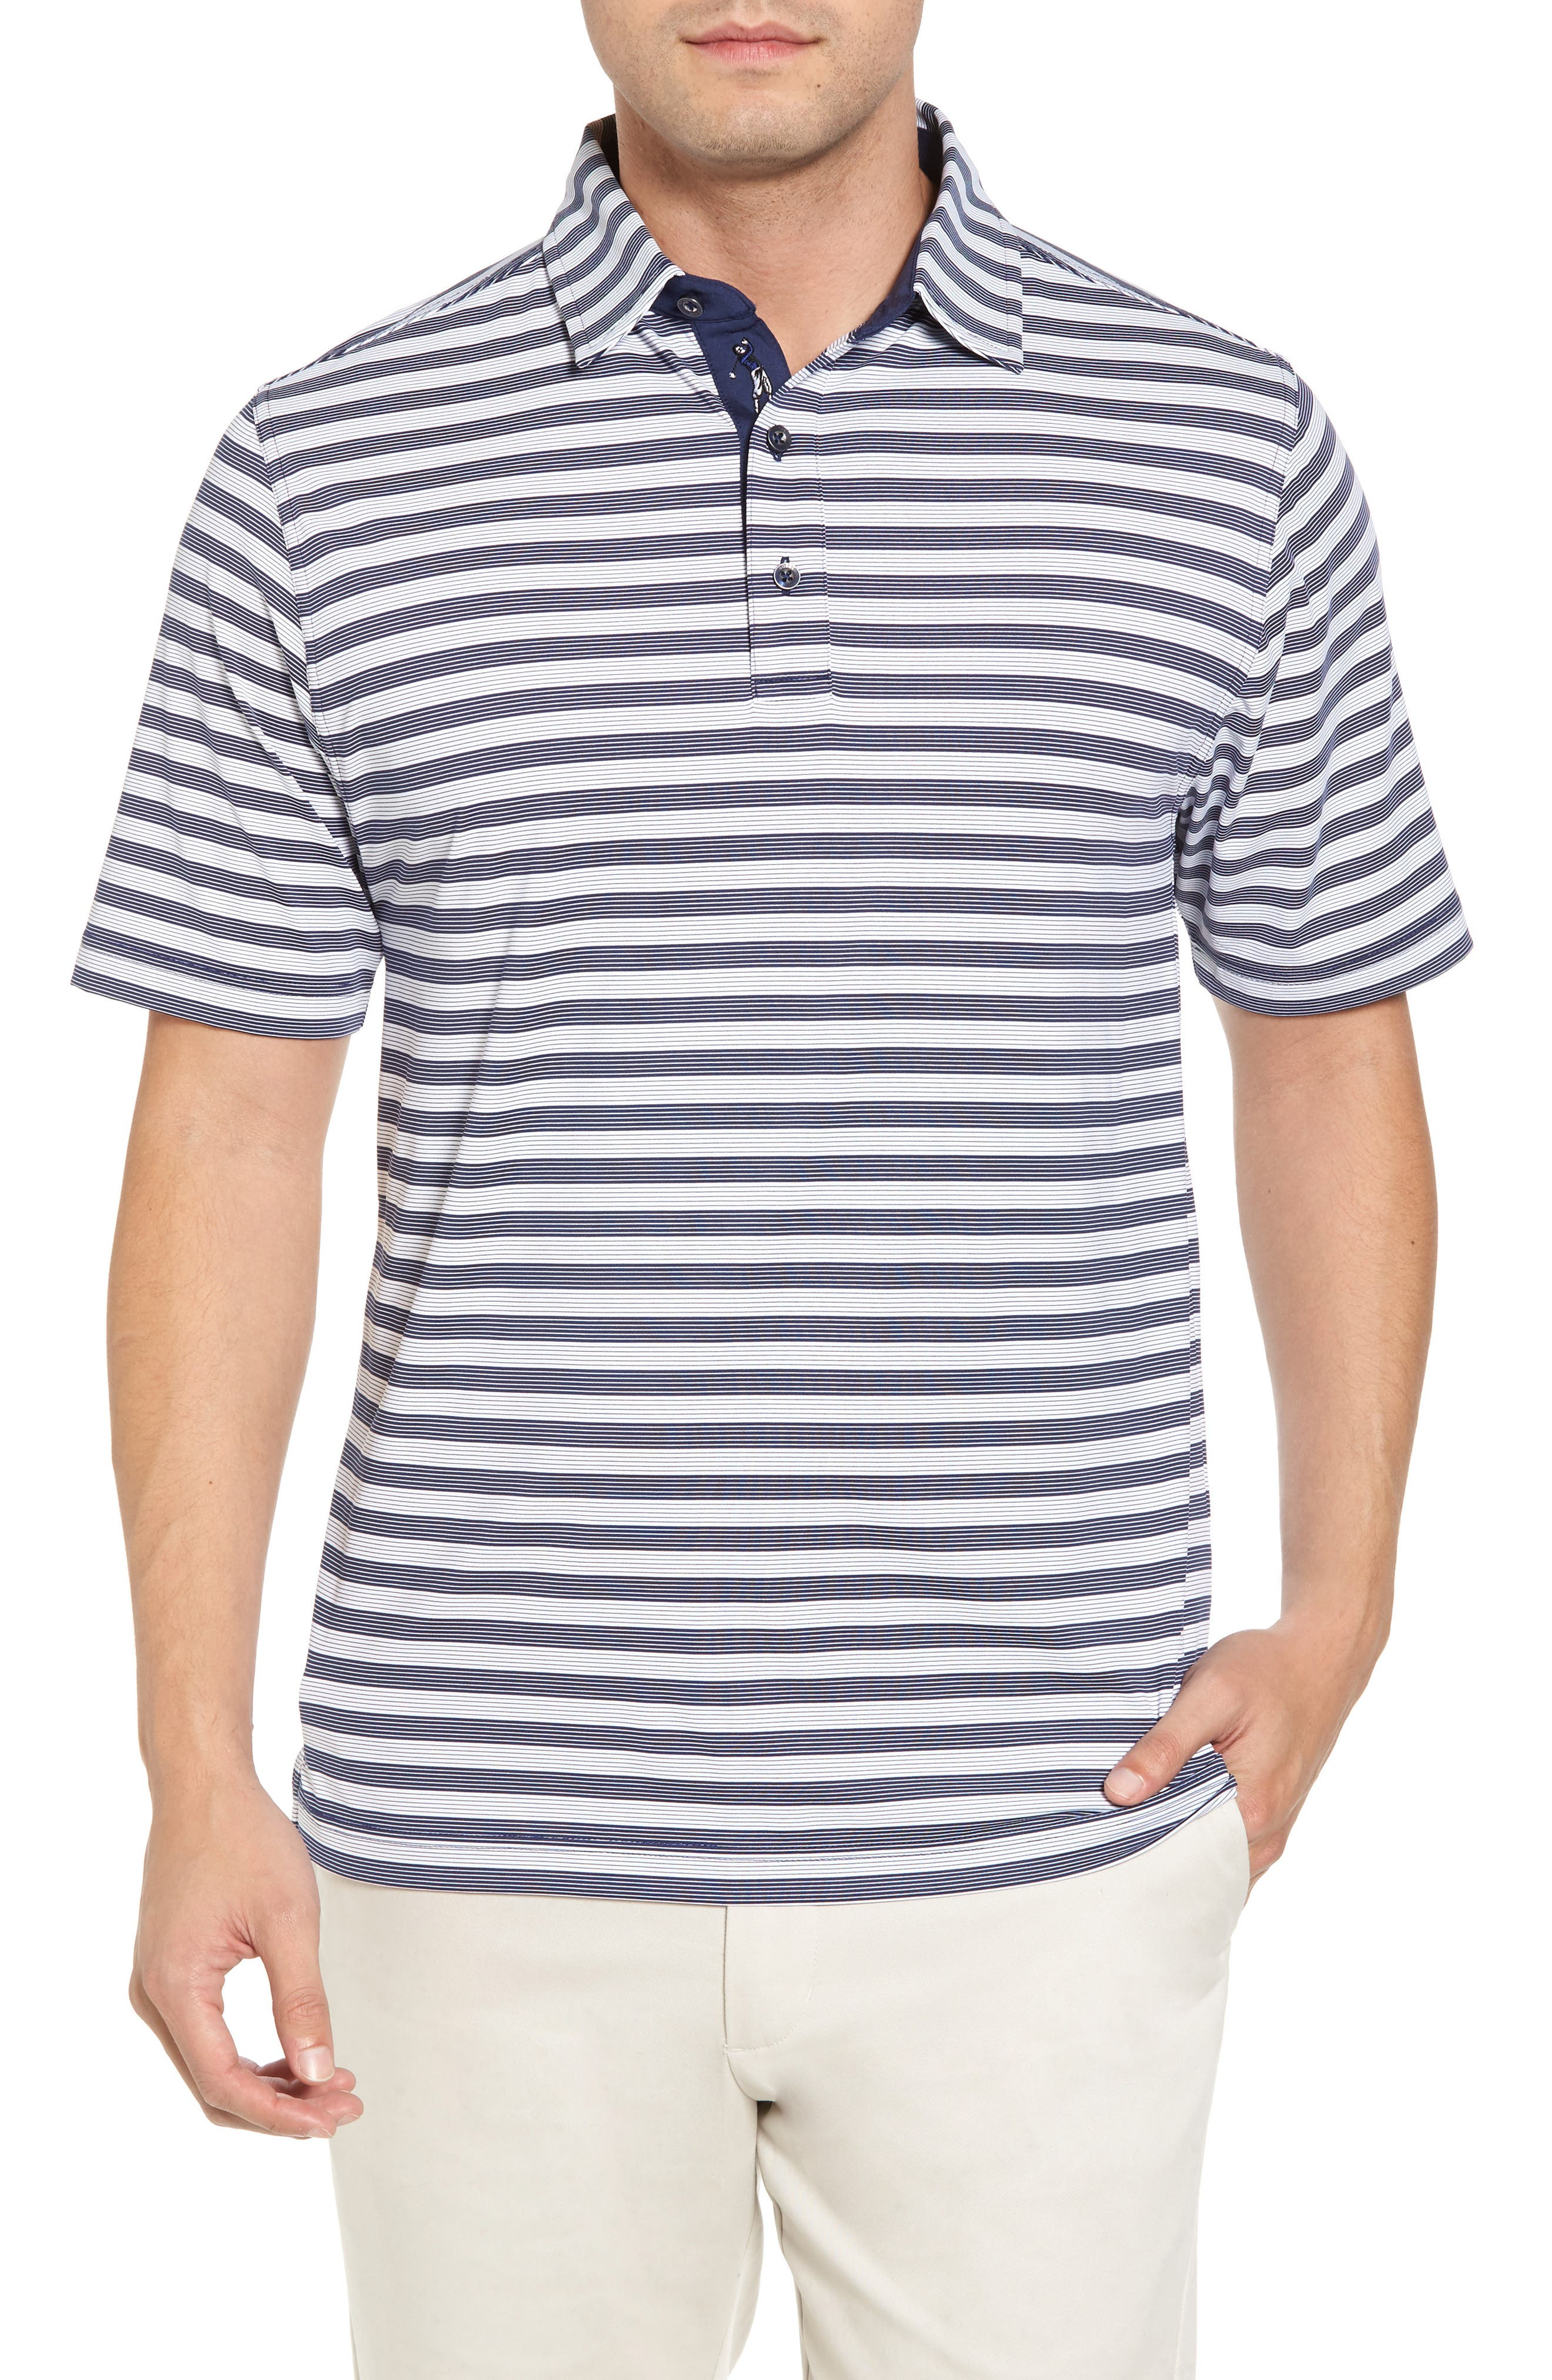 XH2O Del Mar Stripe Jersey Polo,                         Main,                         color, Summer Navy